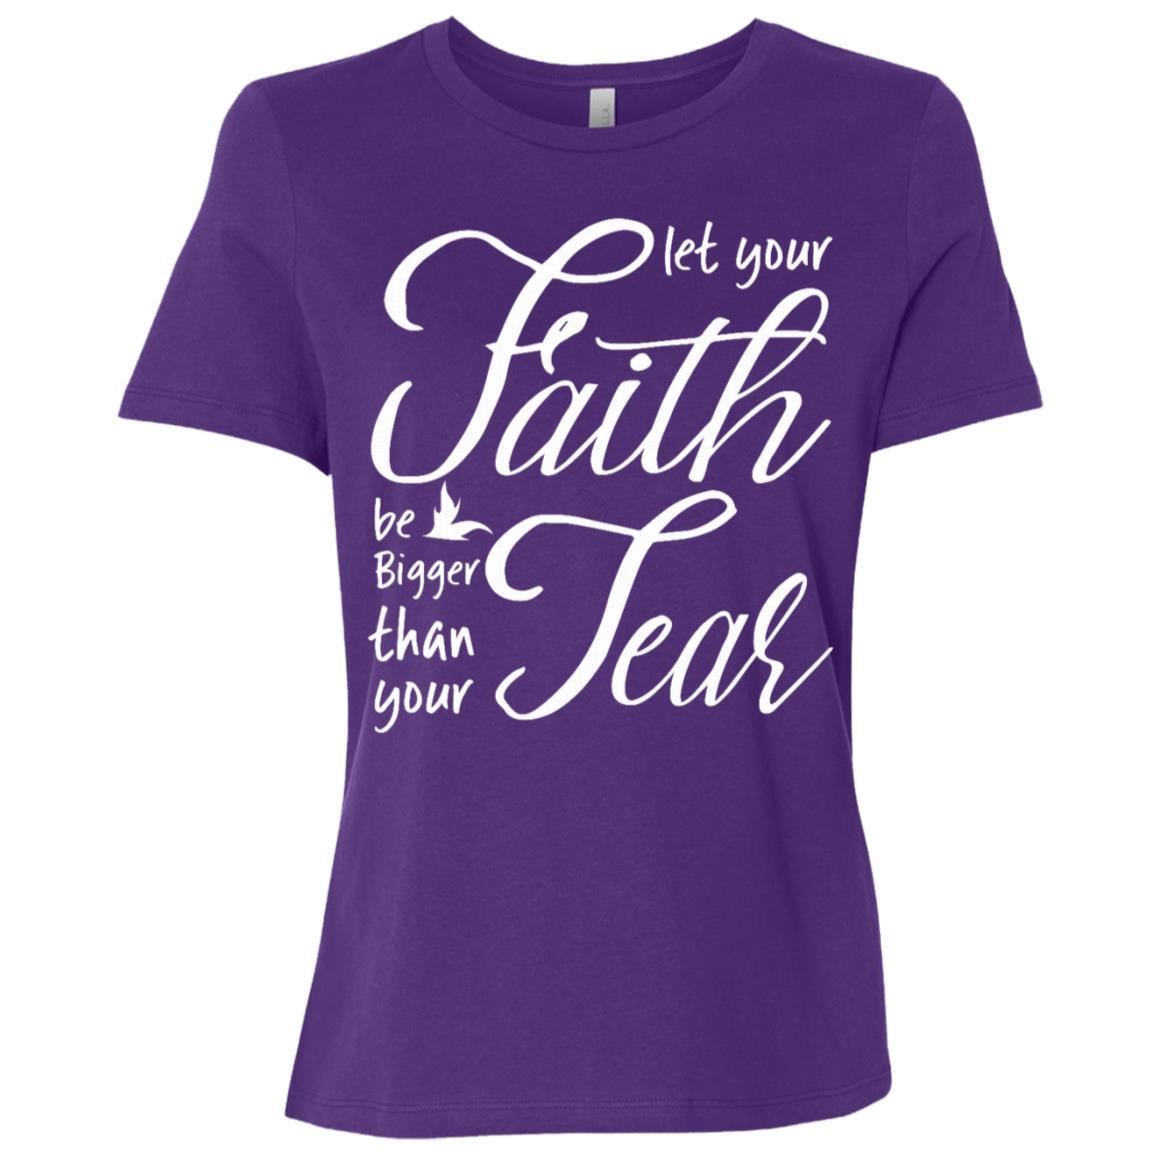 Let your faith be bigger than you fear Women Short Sleeve T-Shirt